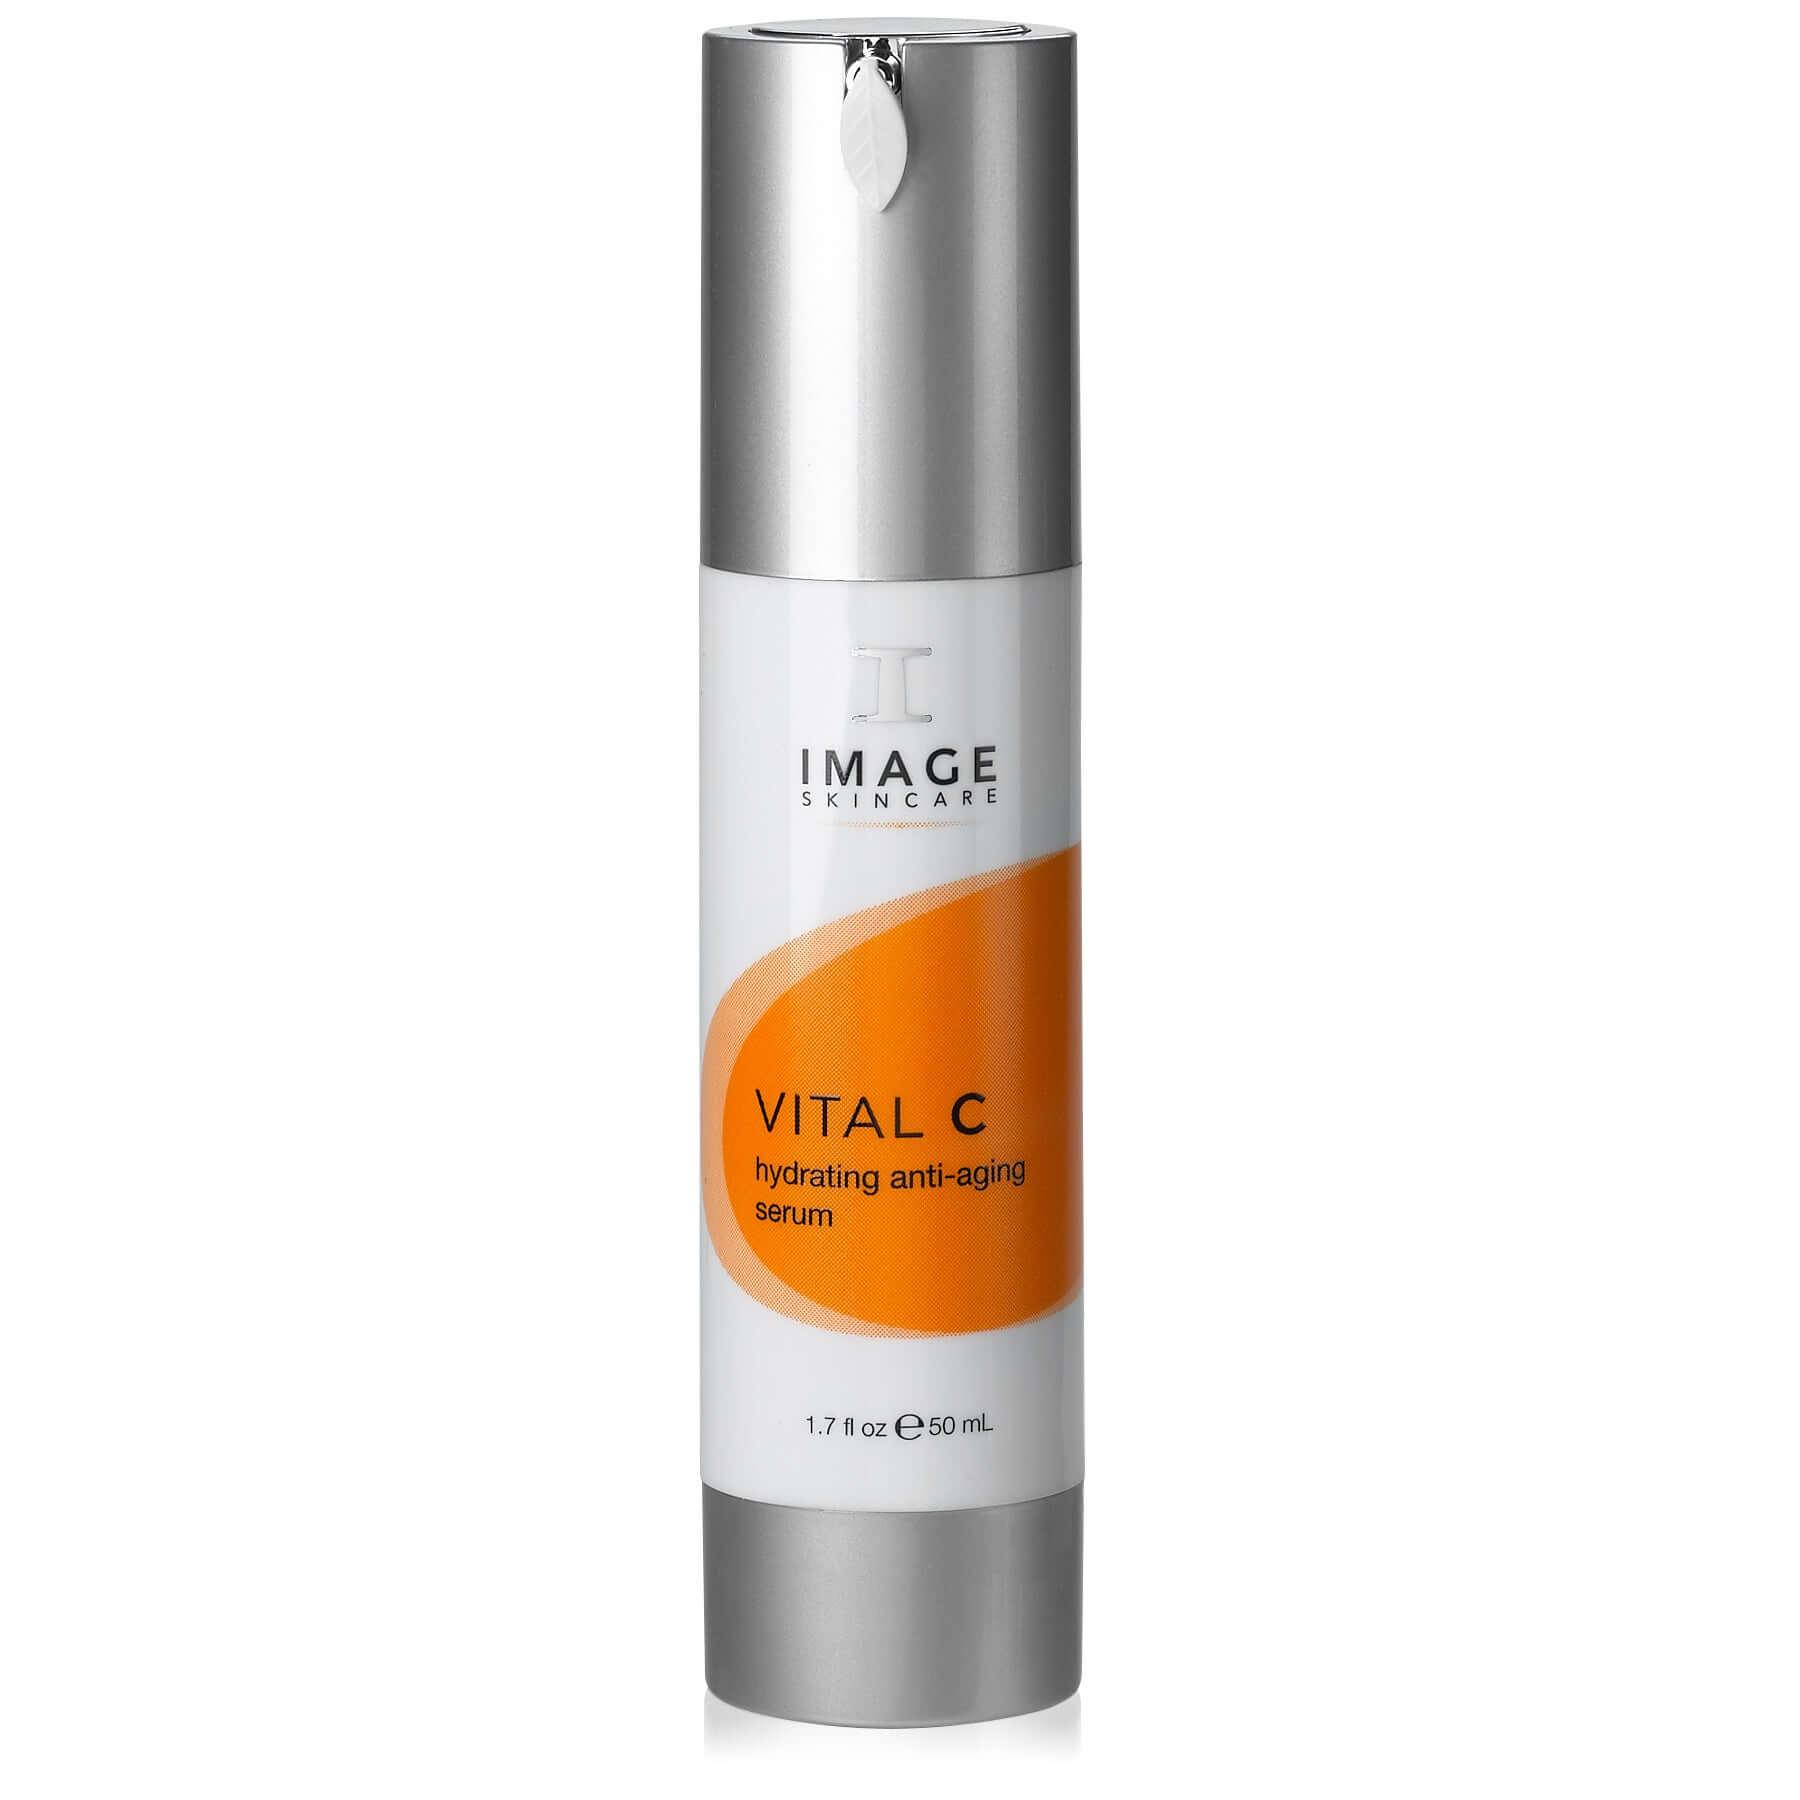 Vital C Hydrating Anti Aging Serum